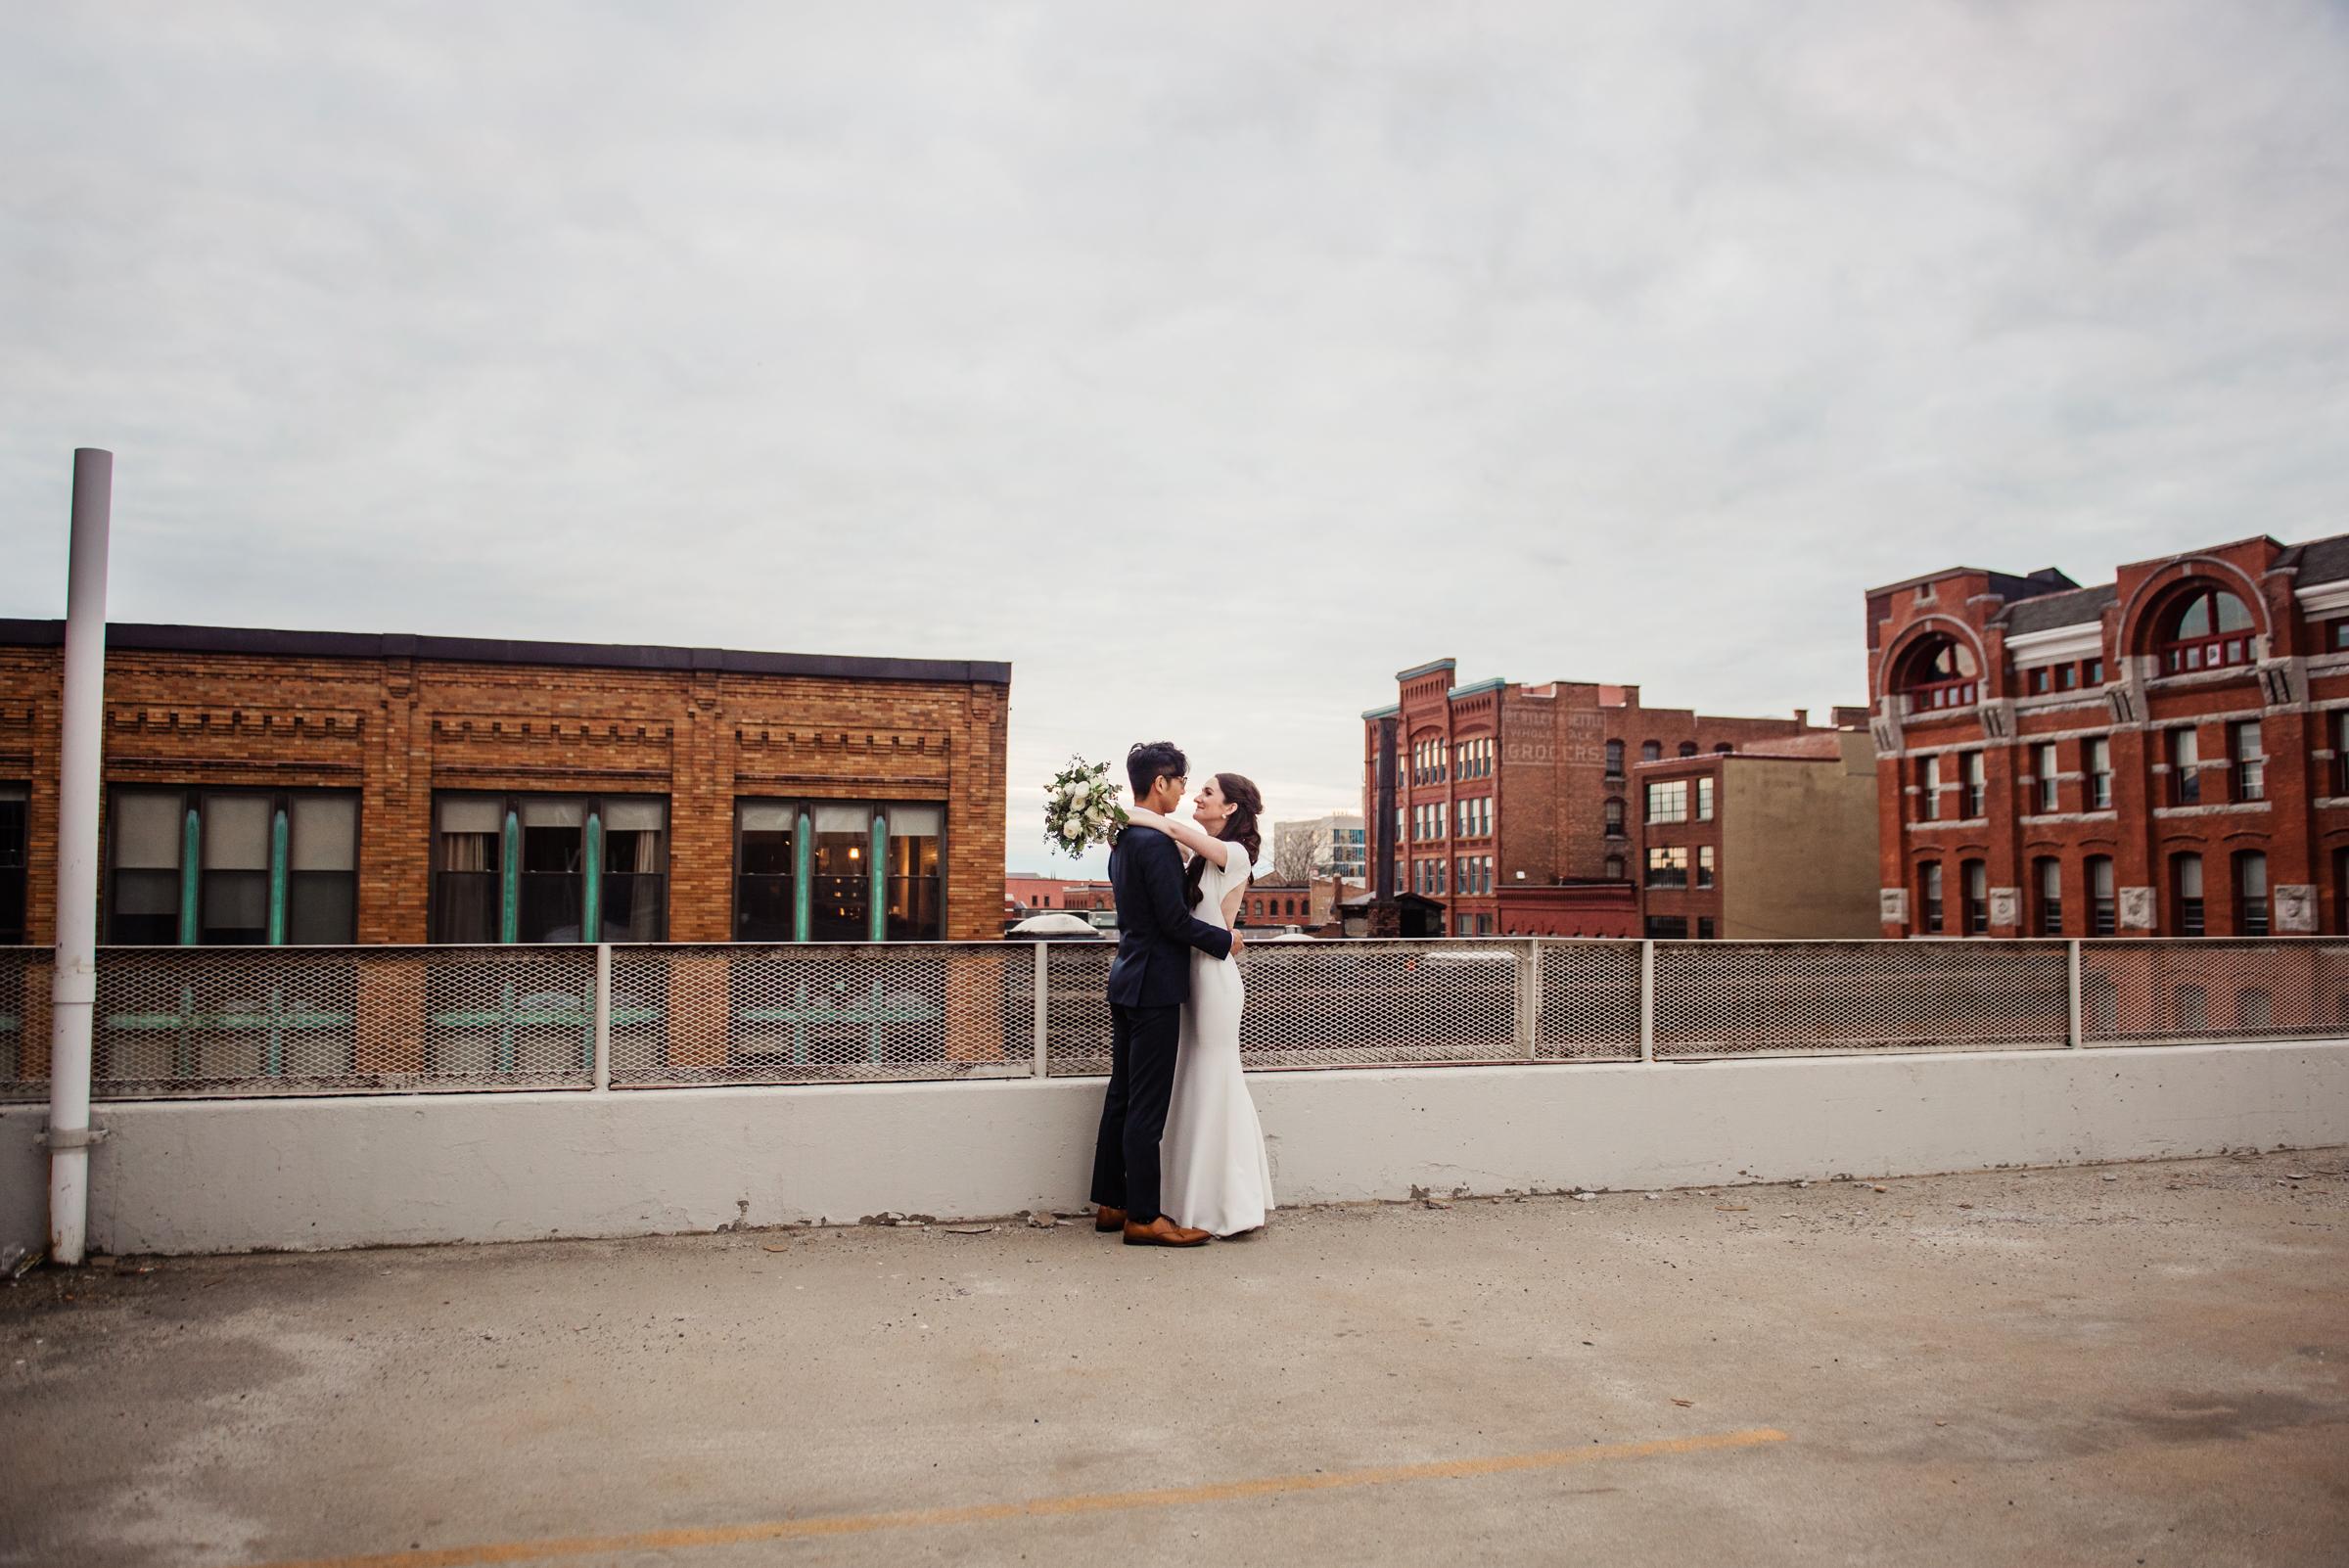 SKY_Armory_Syracuse_Wedding_JILL_STUDIO_Rochester_NY_Photographer_DSC_6248.jpg